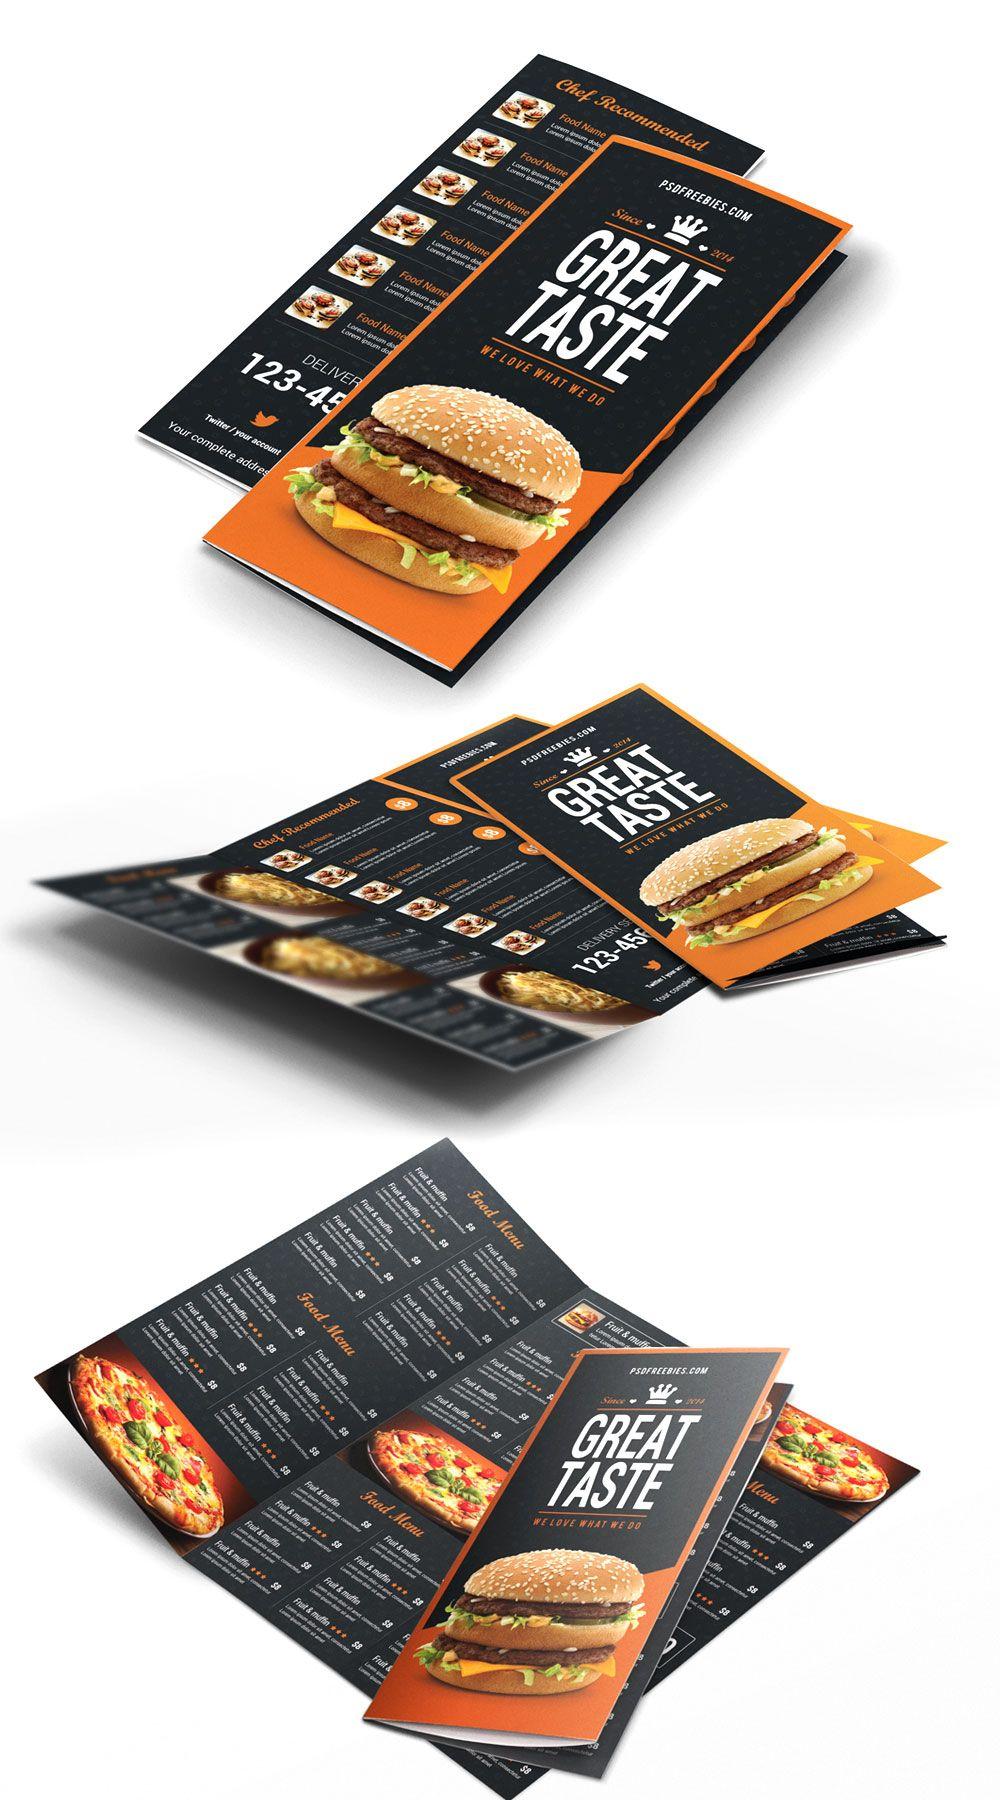 Fast Food Menu Trifold Brochure Free PSD | Asas, Restaurante y ...